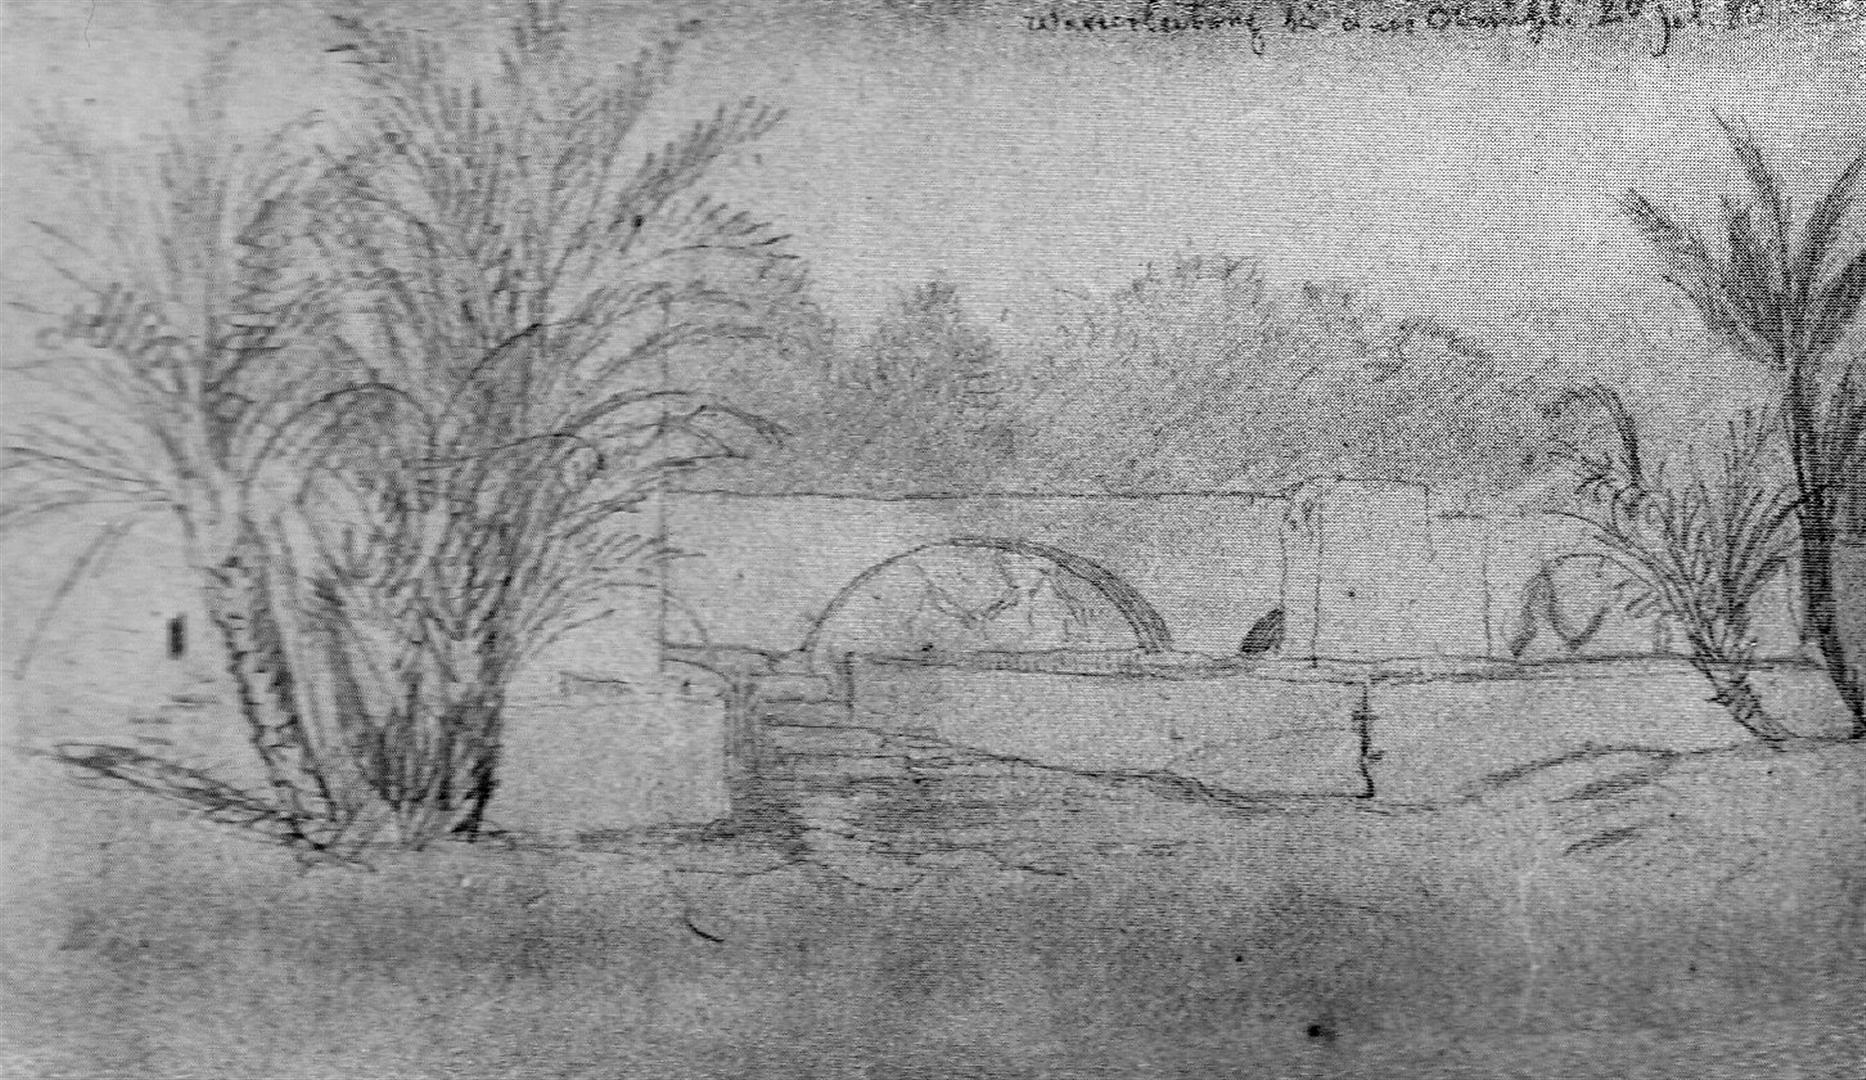 canal-principal-beodo-1880-1